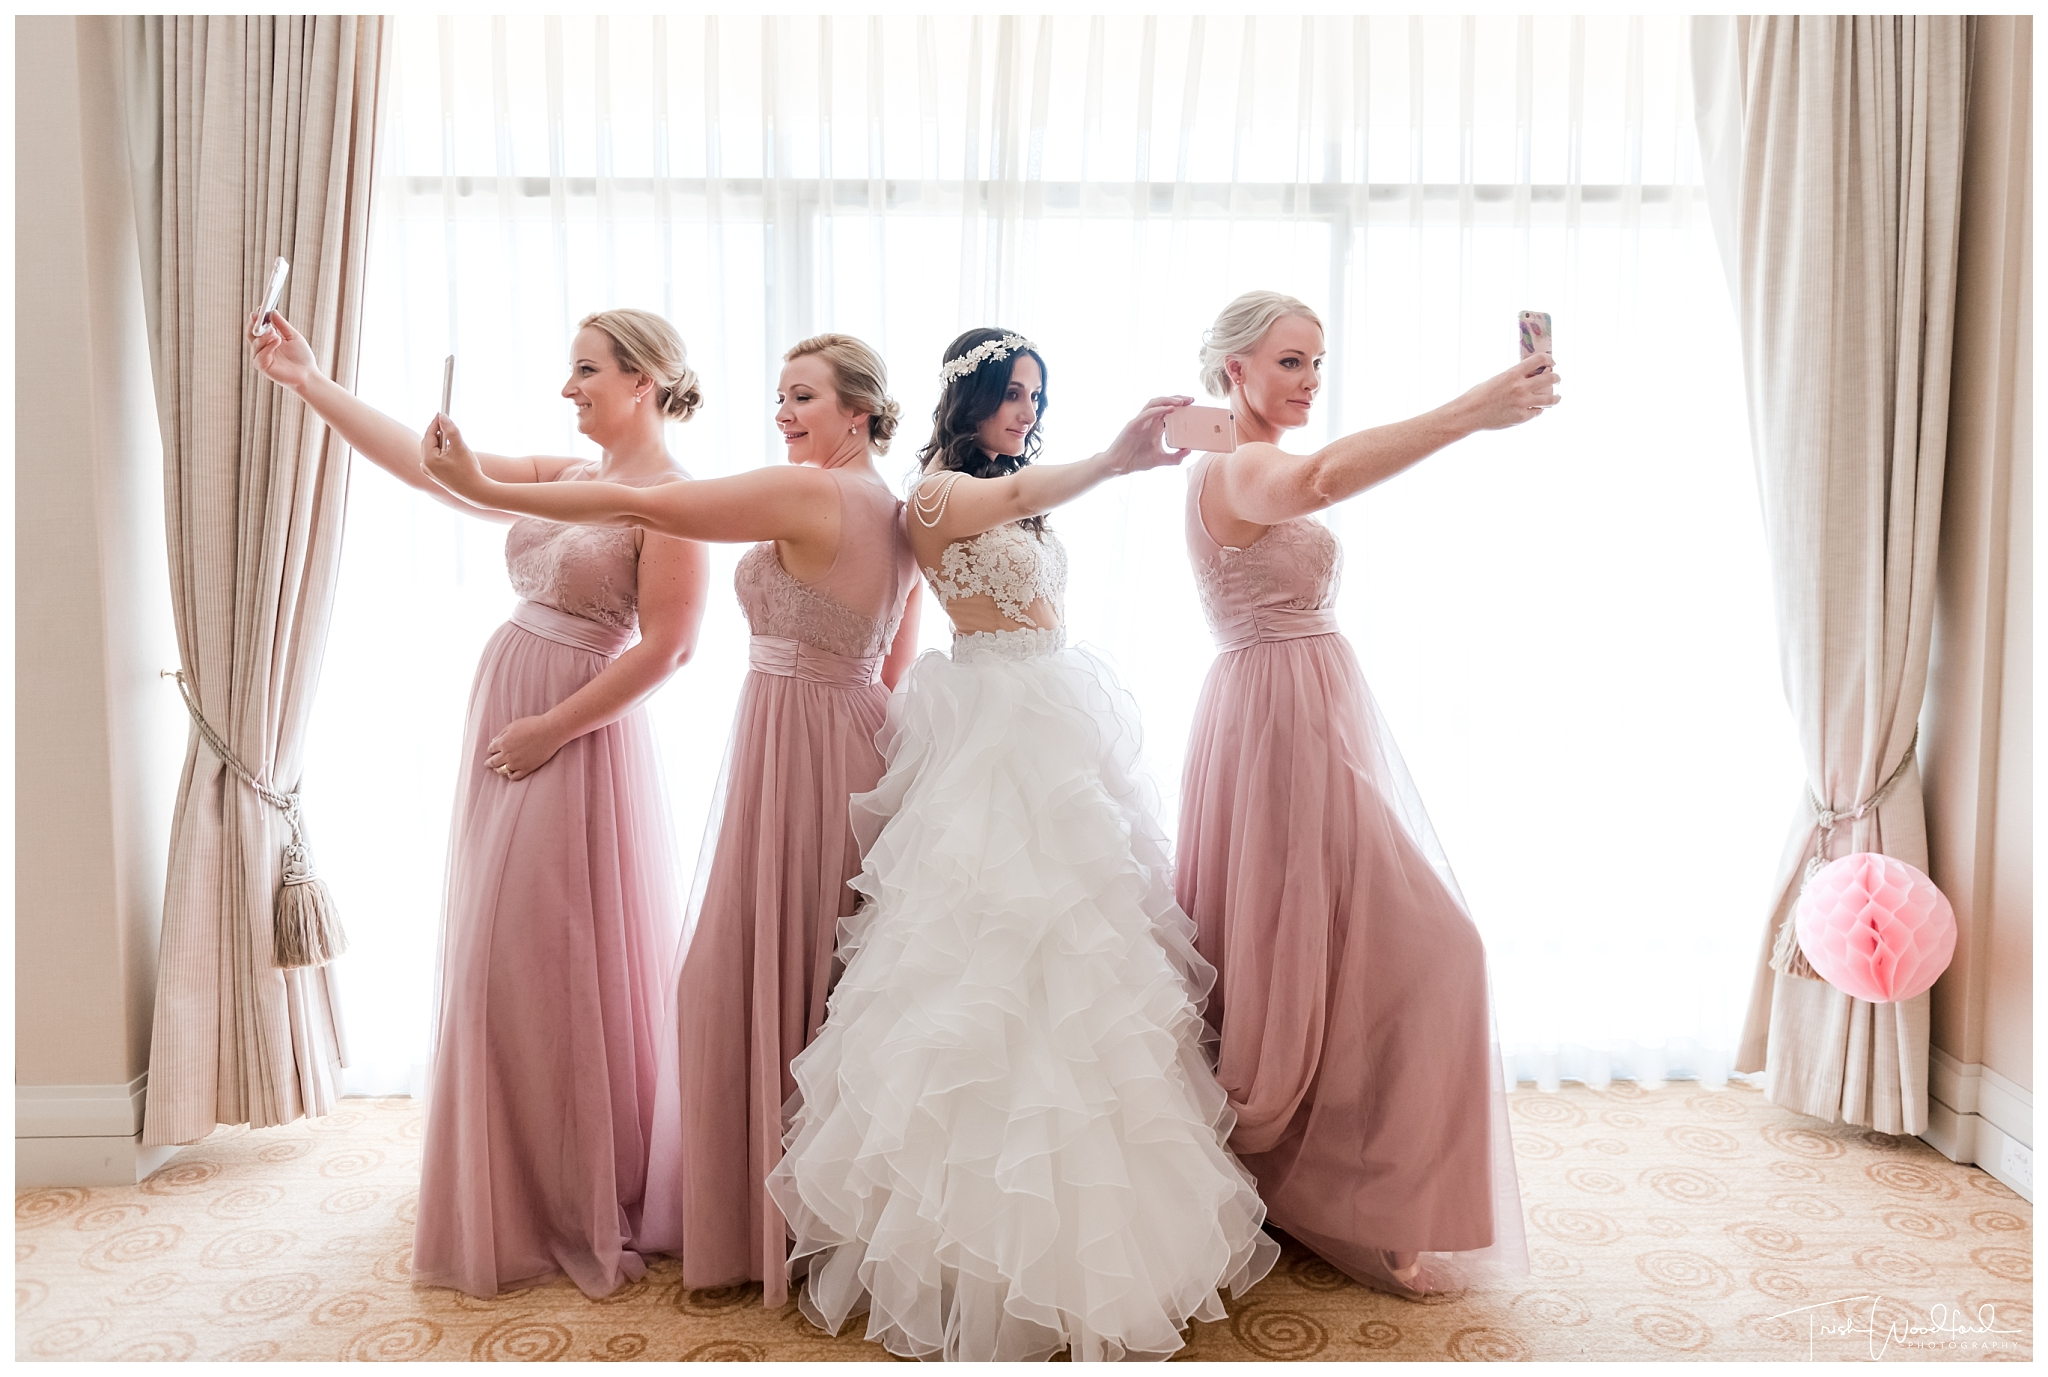 Perth Bride & Bridesmaids Selfie